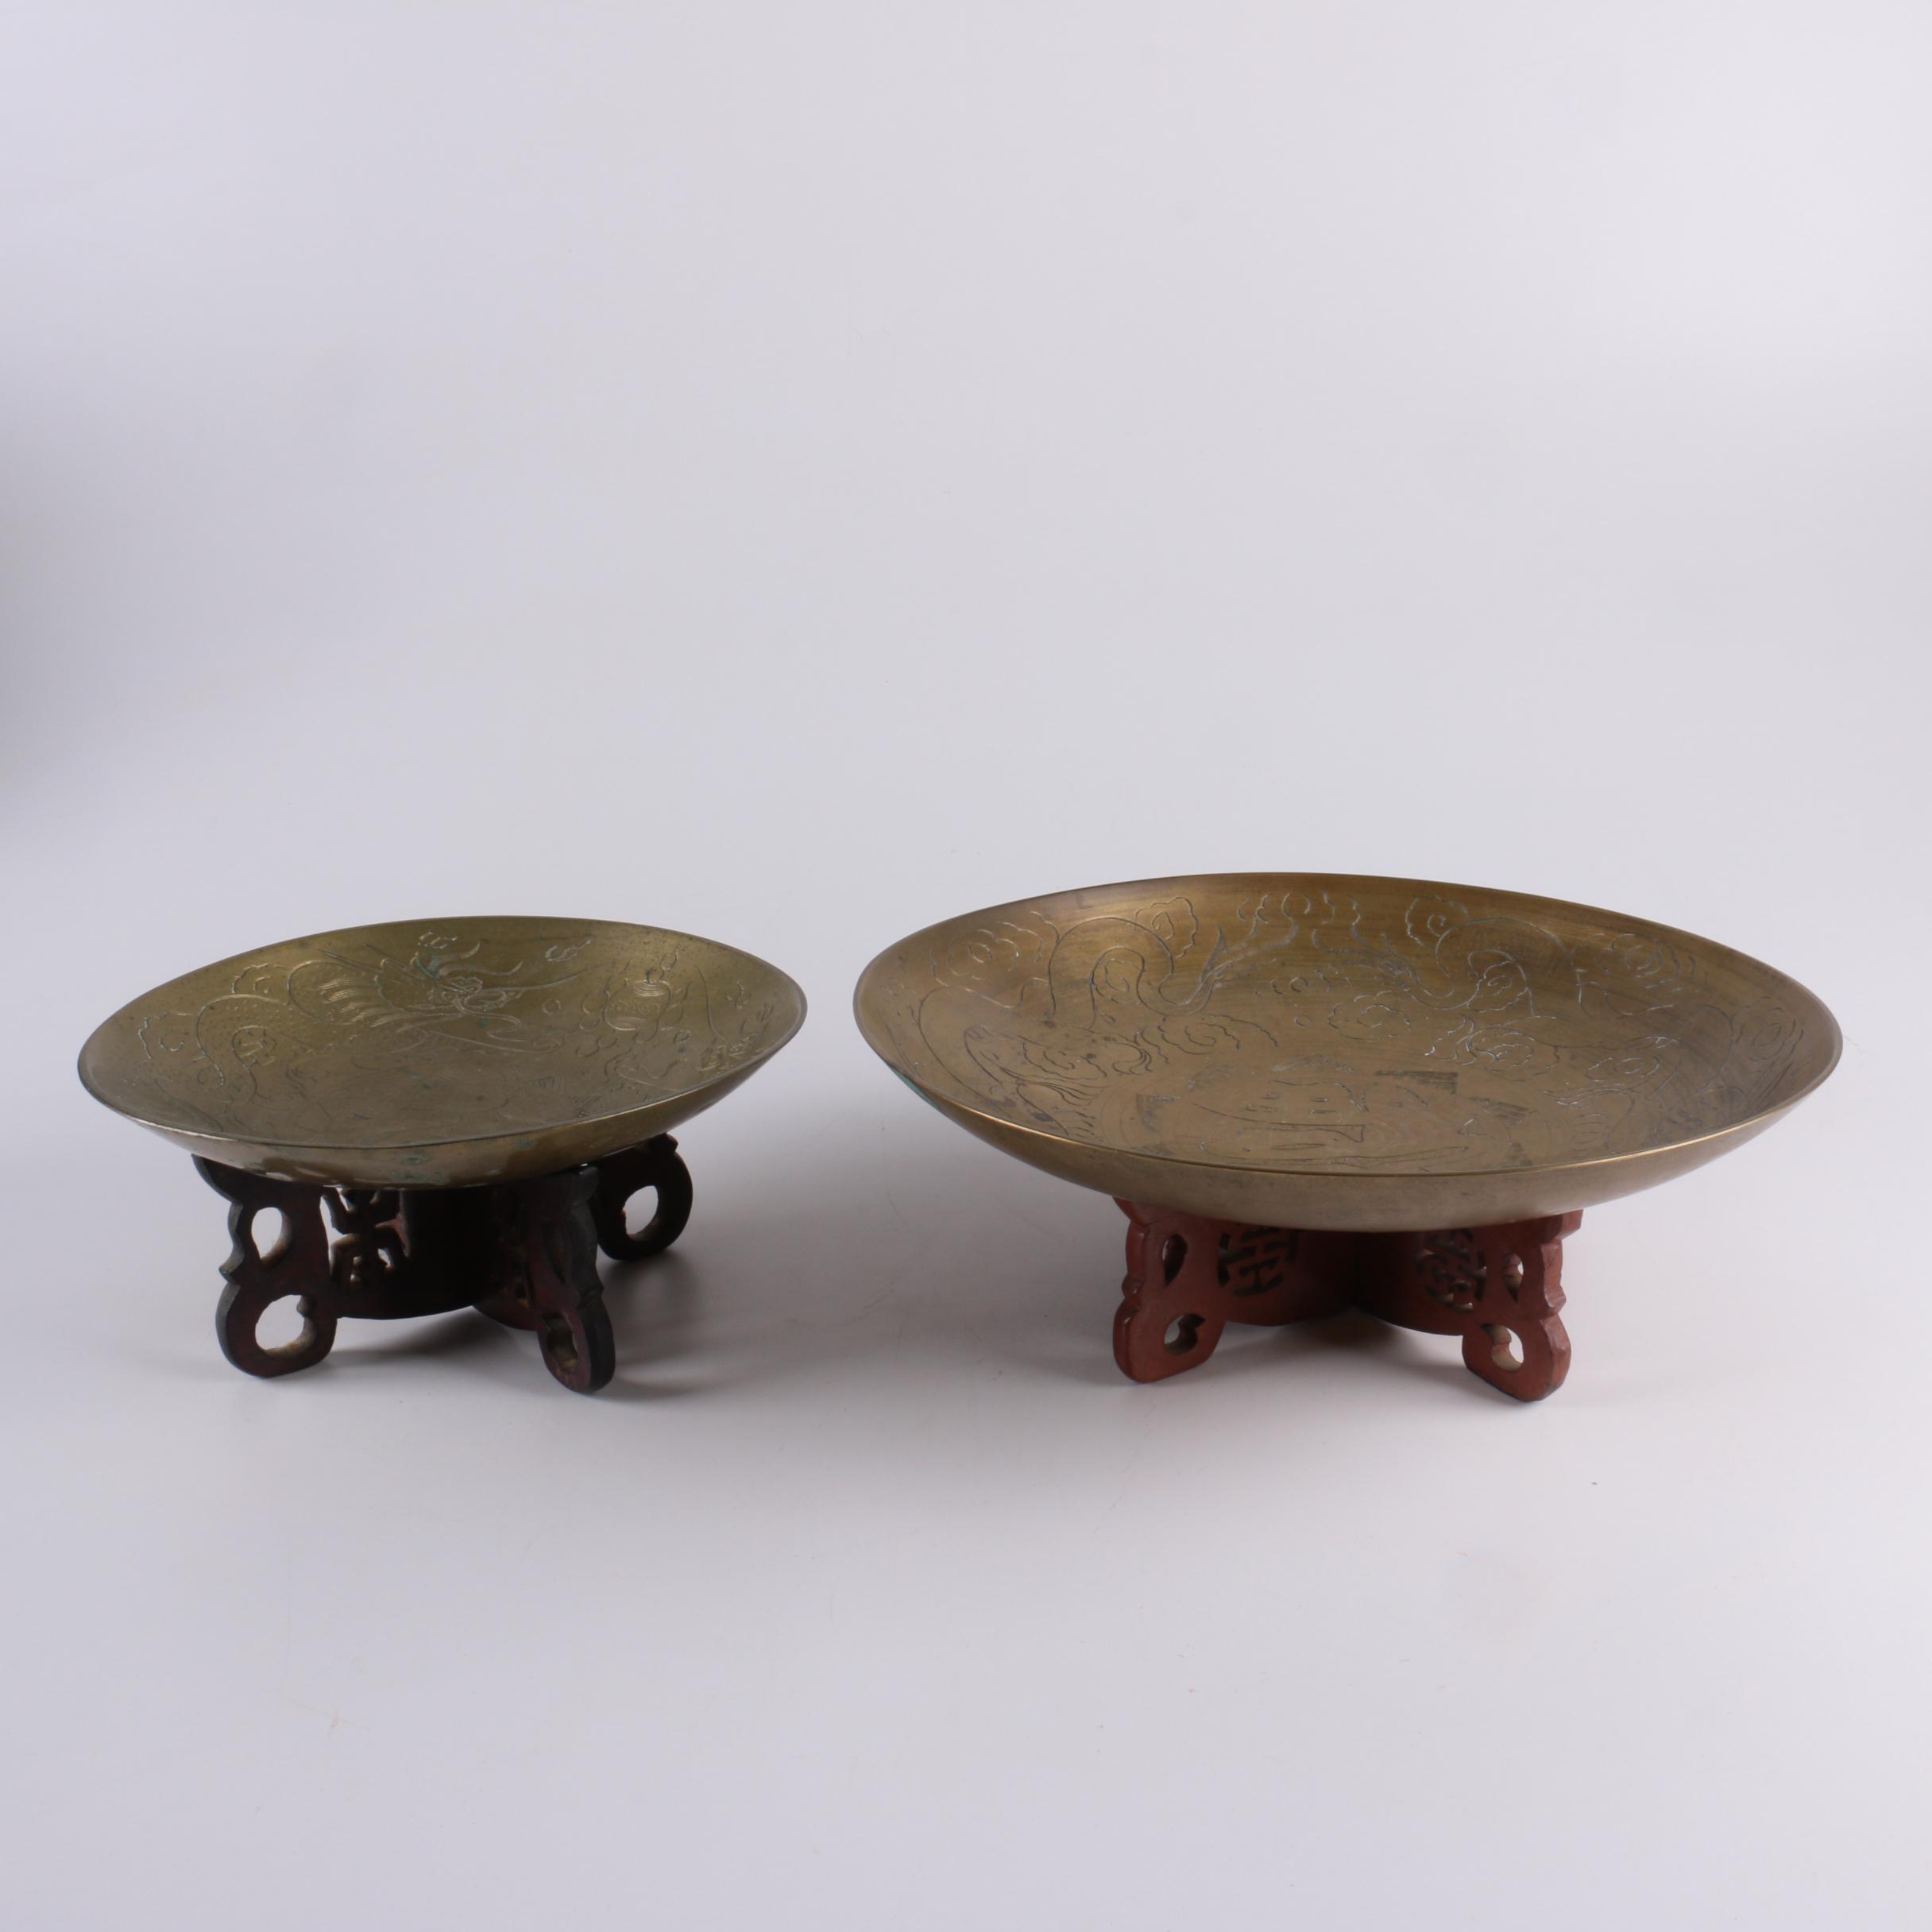 Chinese Brass Dragon Bowls